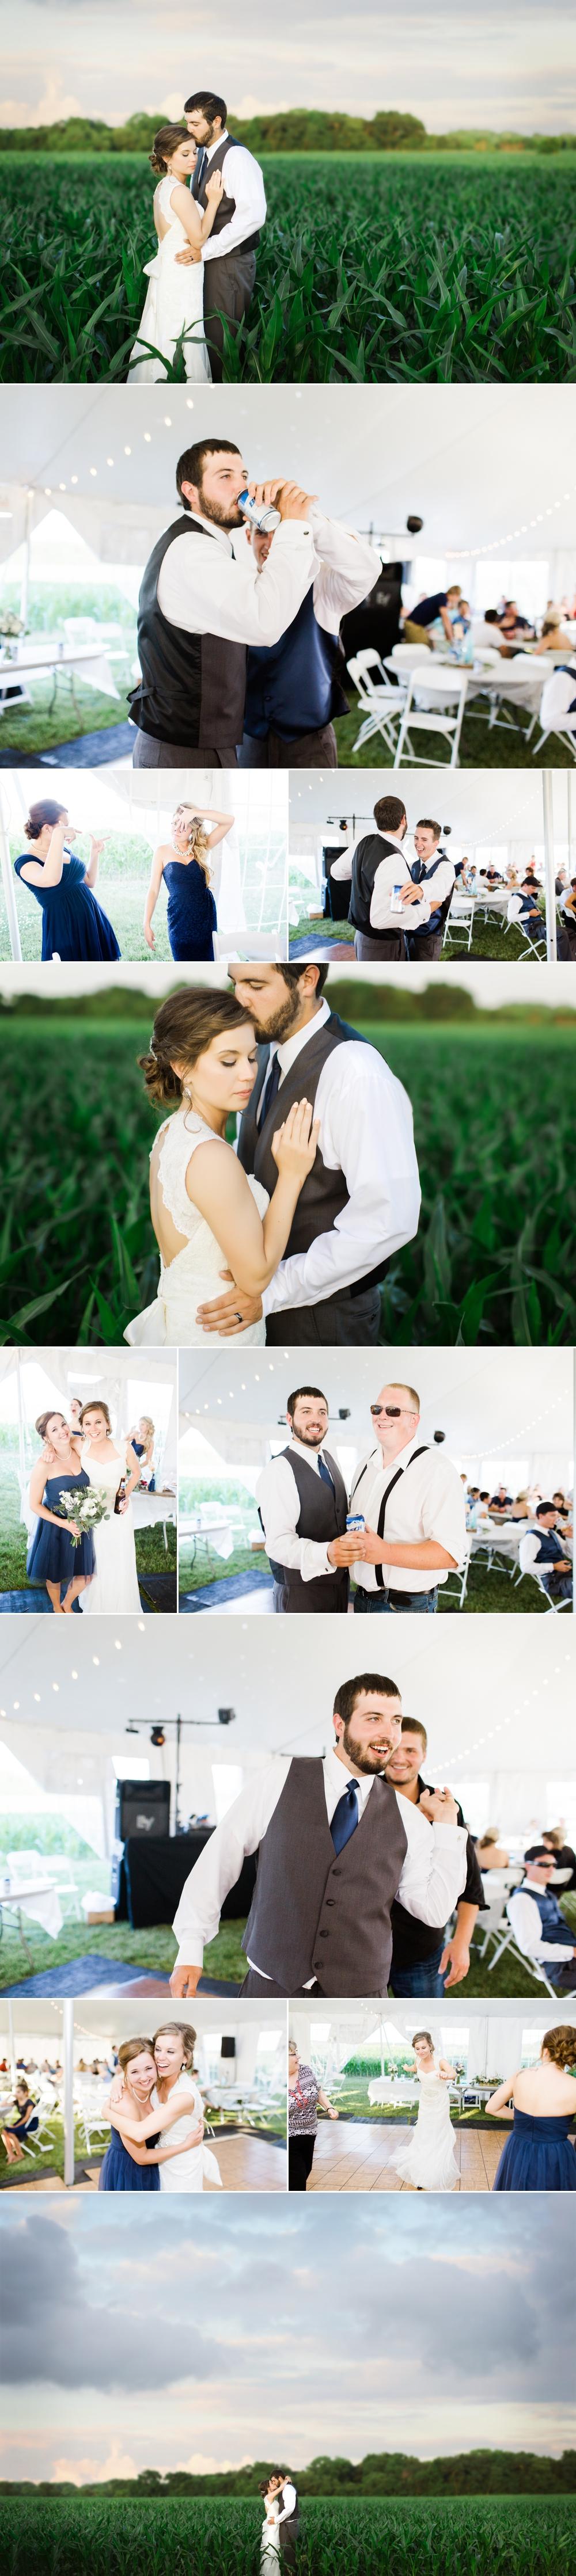 Ely Blog Collage 9.jpg